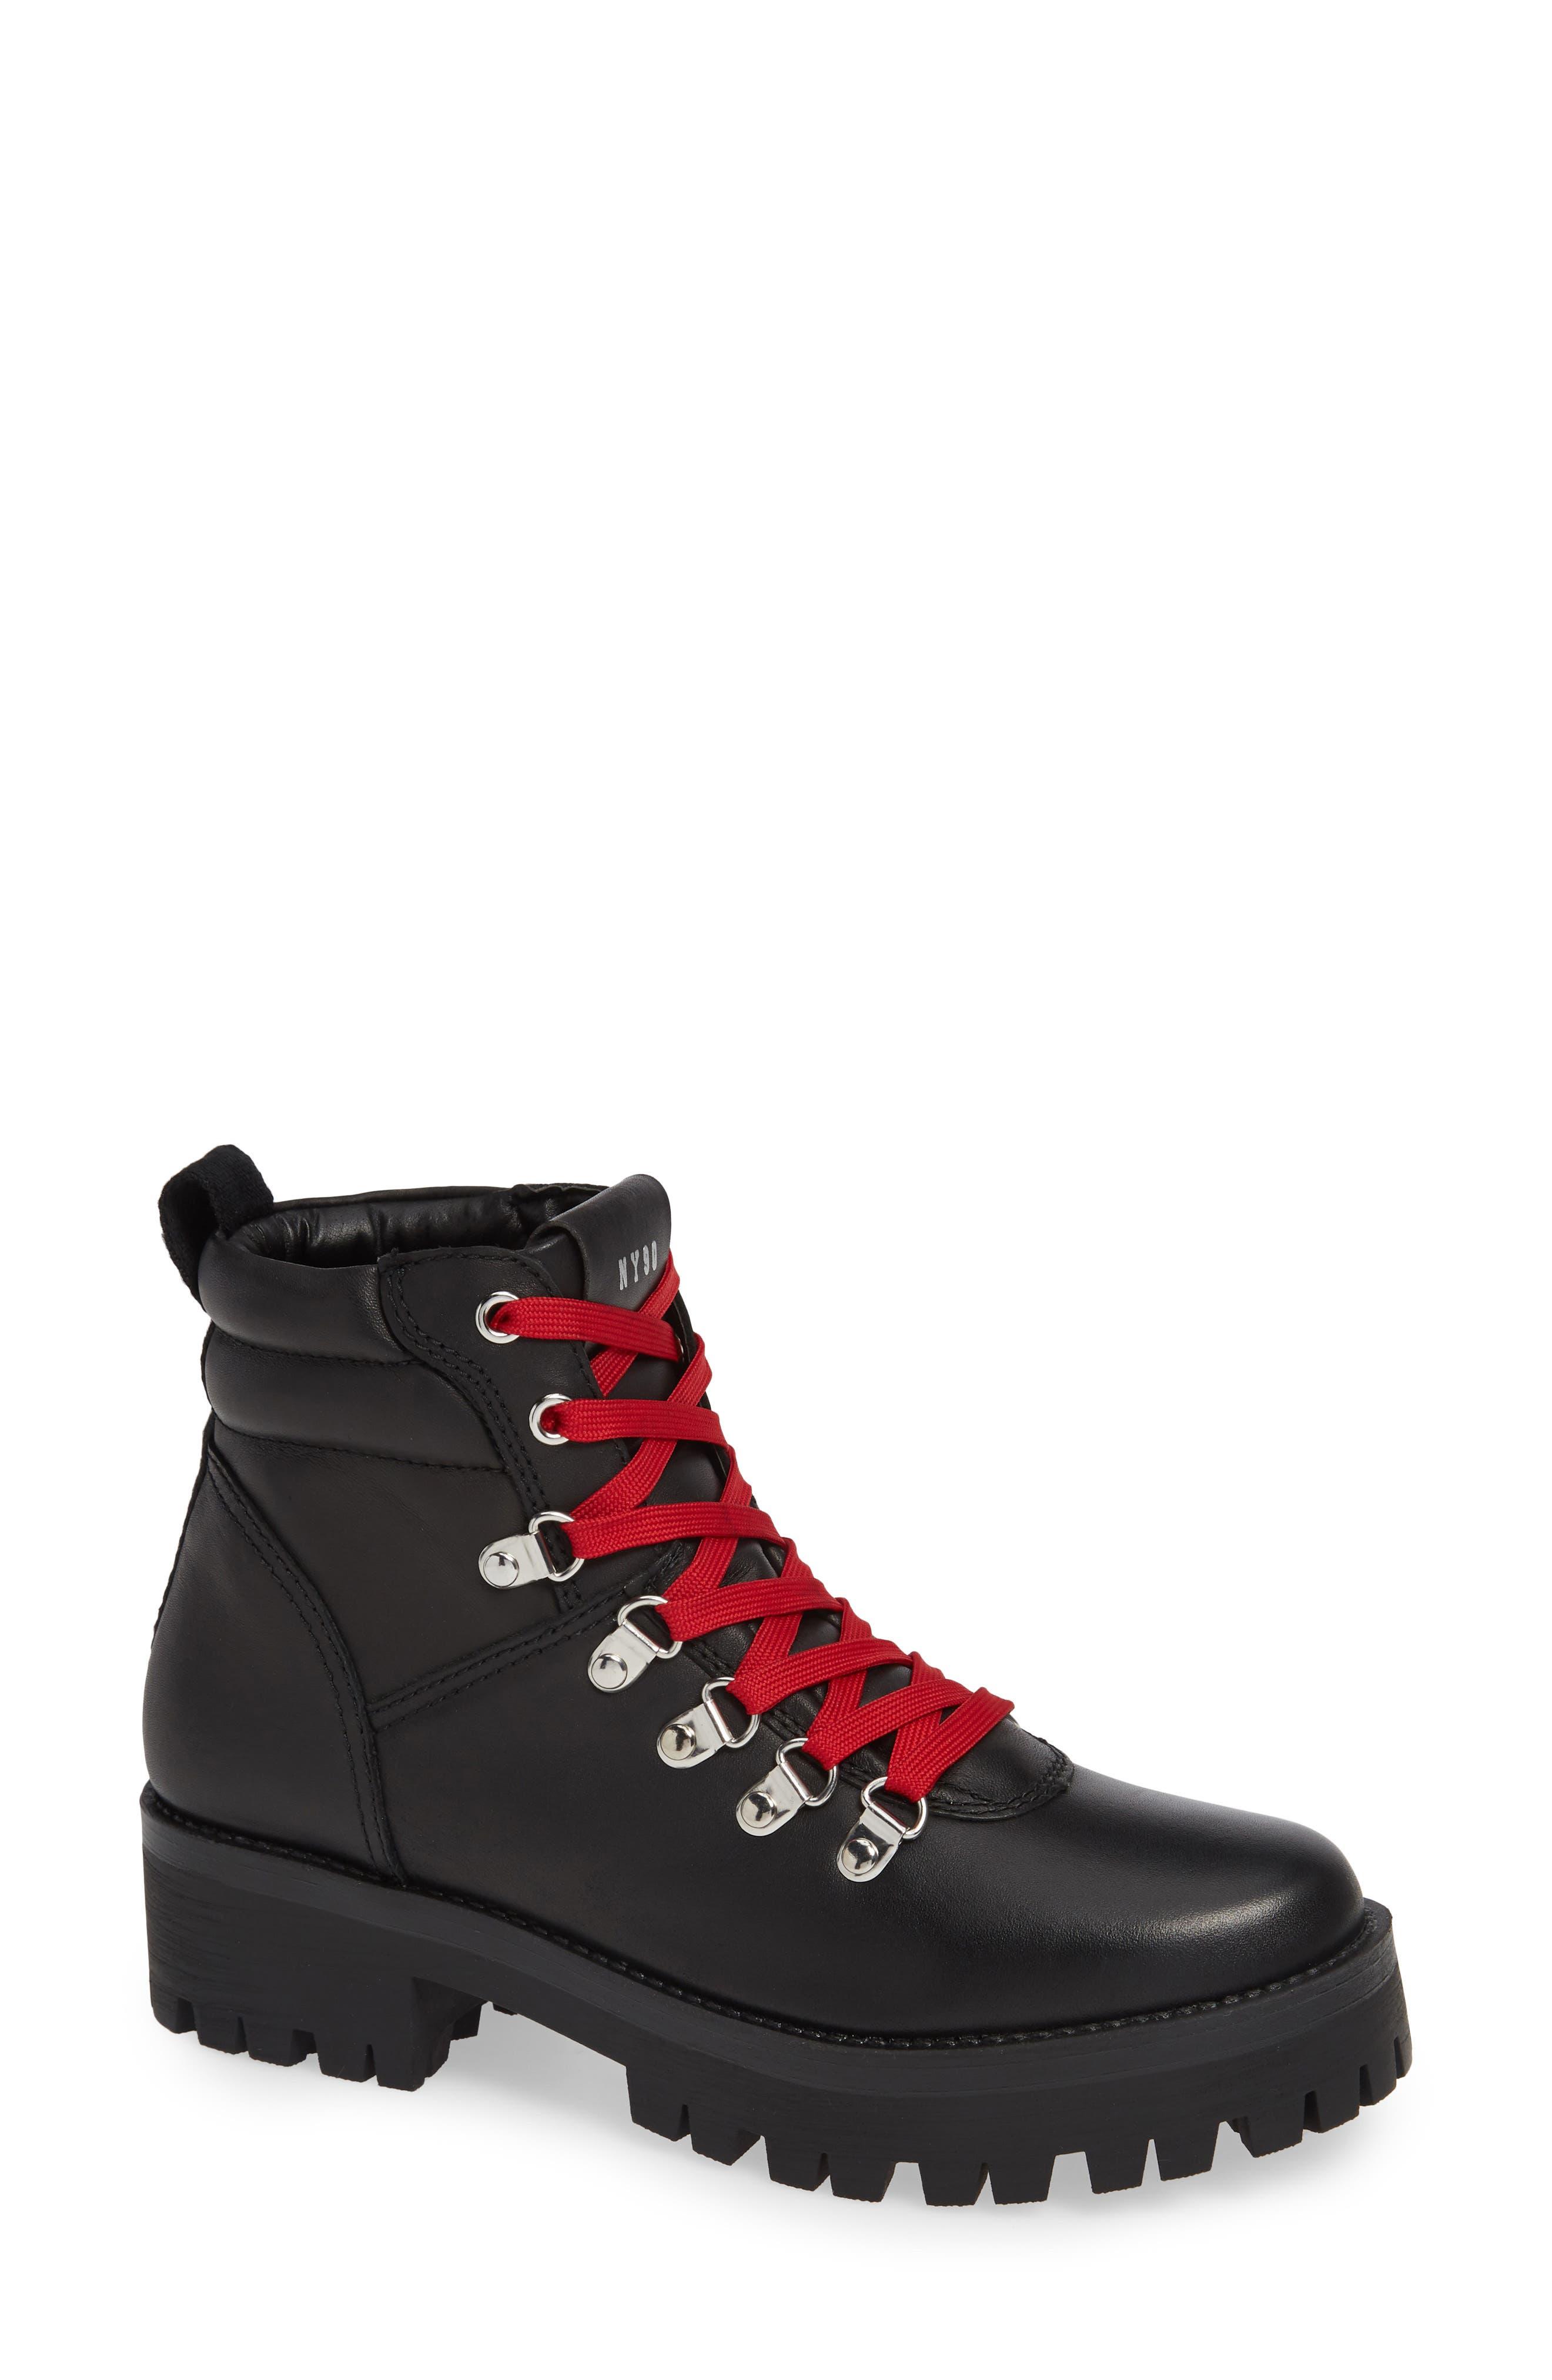 Buzzer Boot,                         Main,                         color, BLACK LEATHER